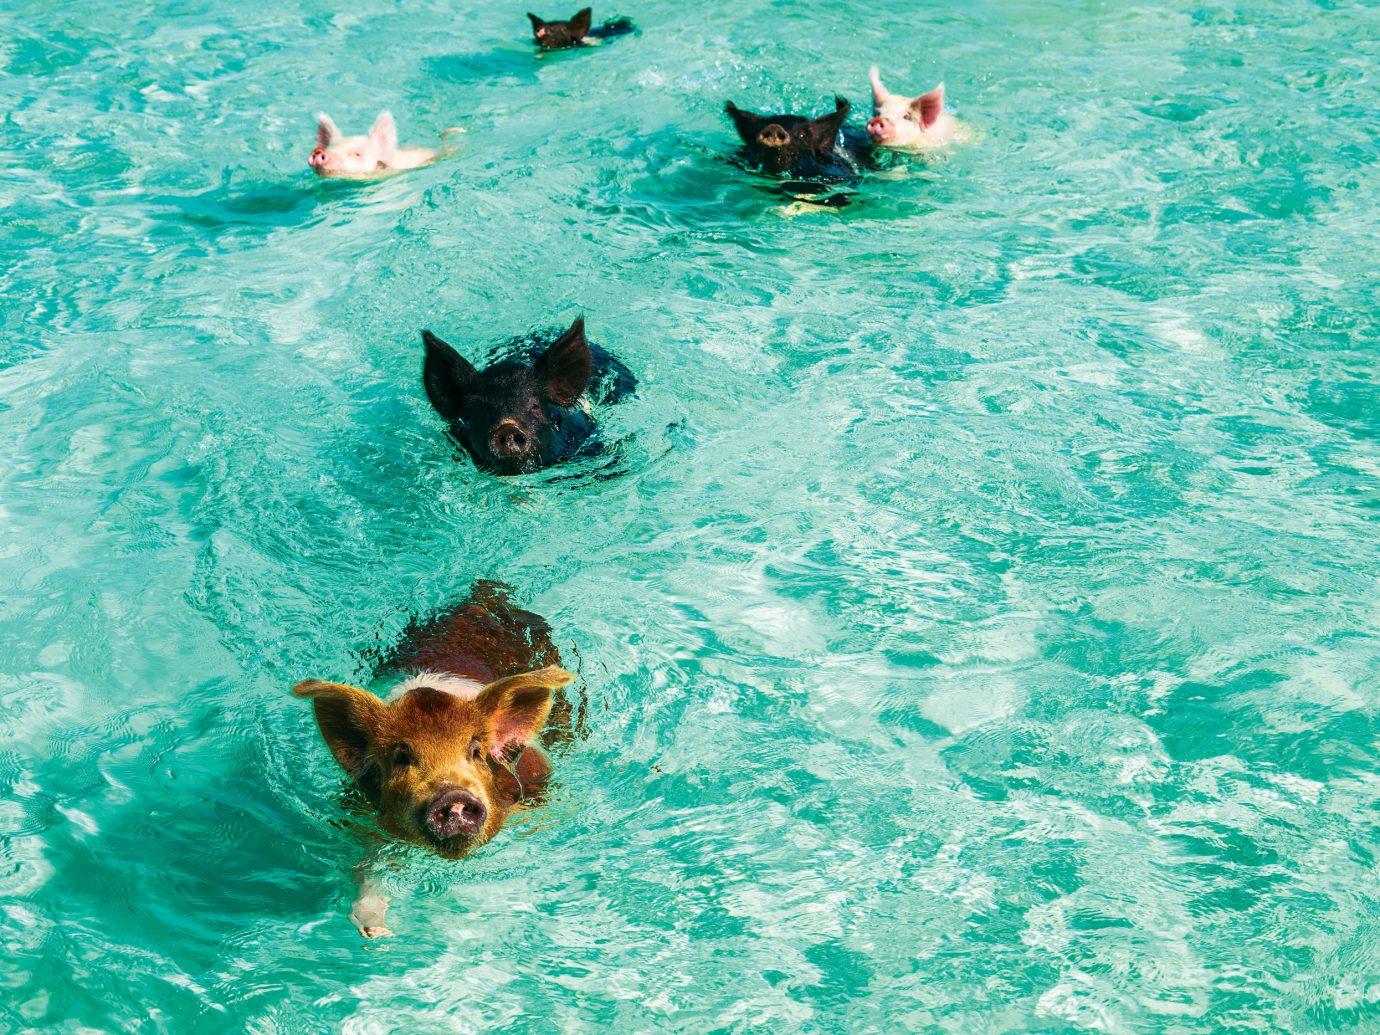 Pigs swimming in the ocean at Grand Isle Resort & Spa, Great Exuma, Bahamas